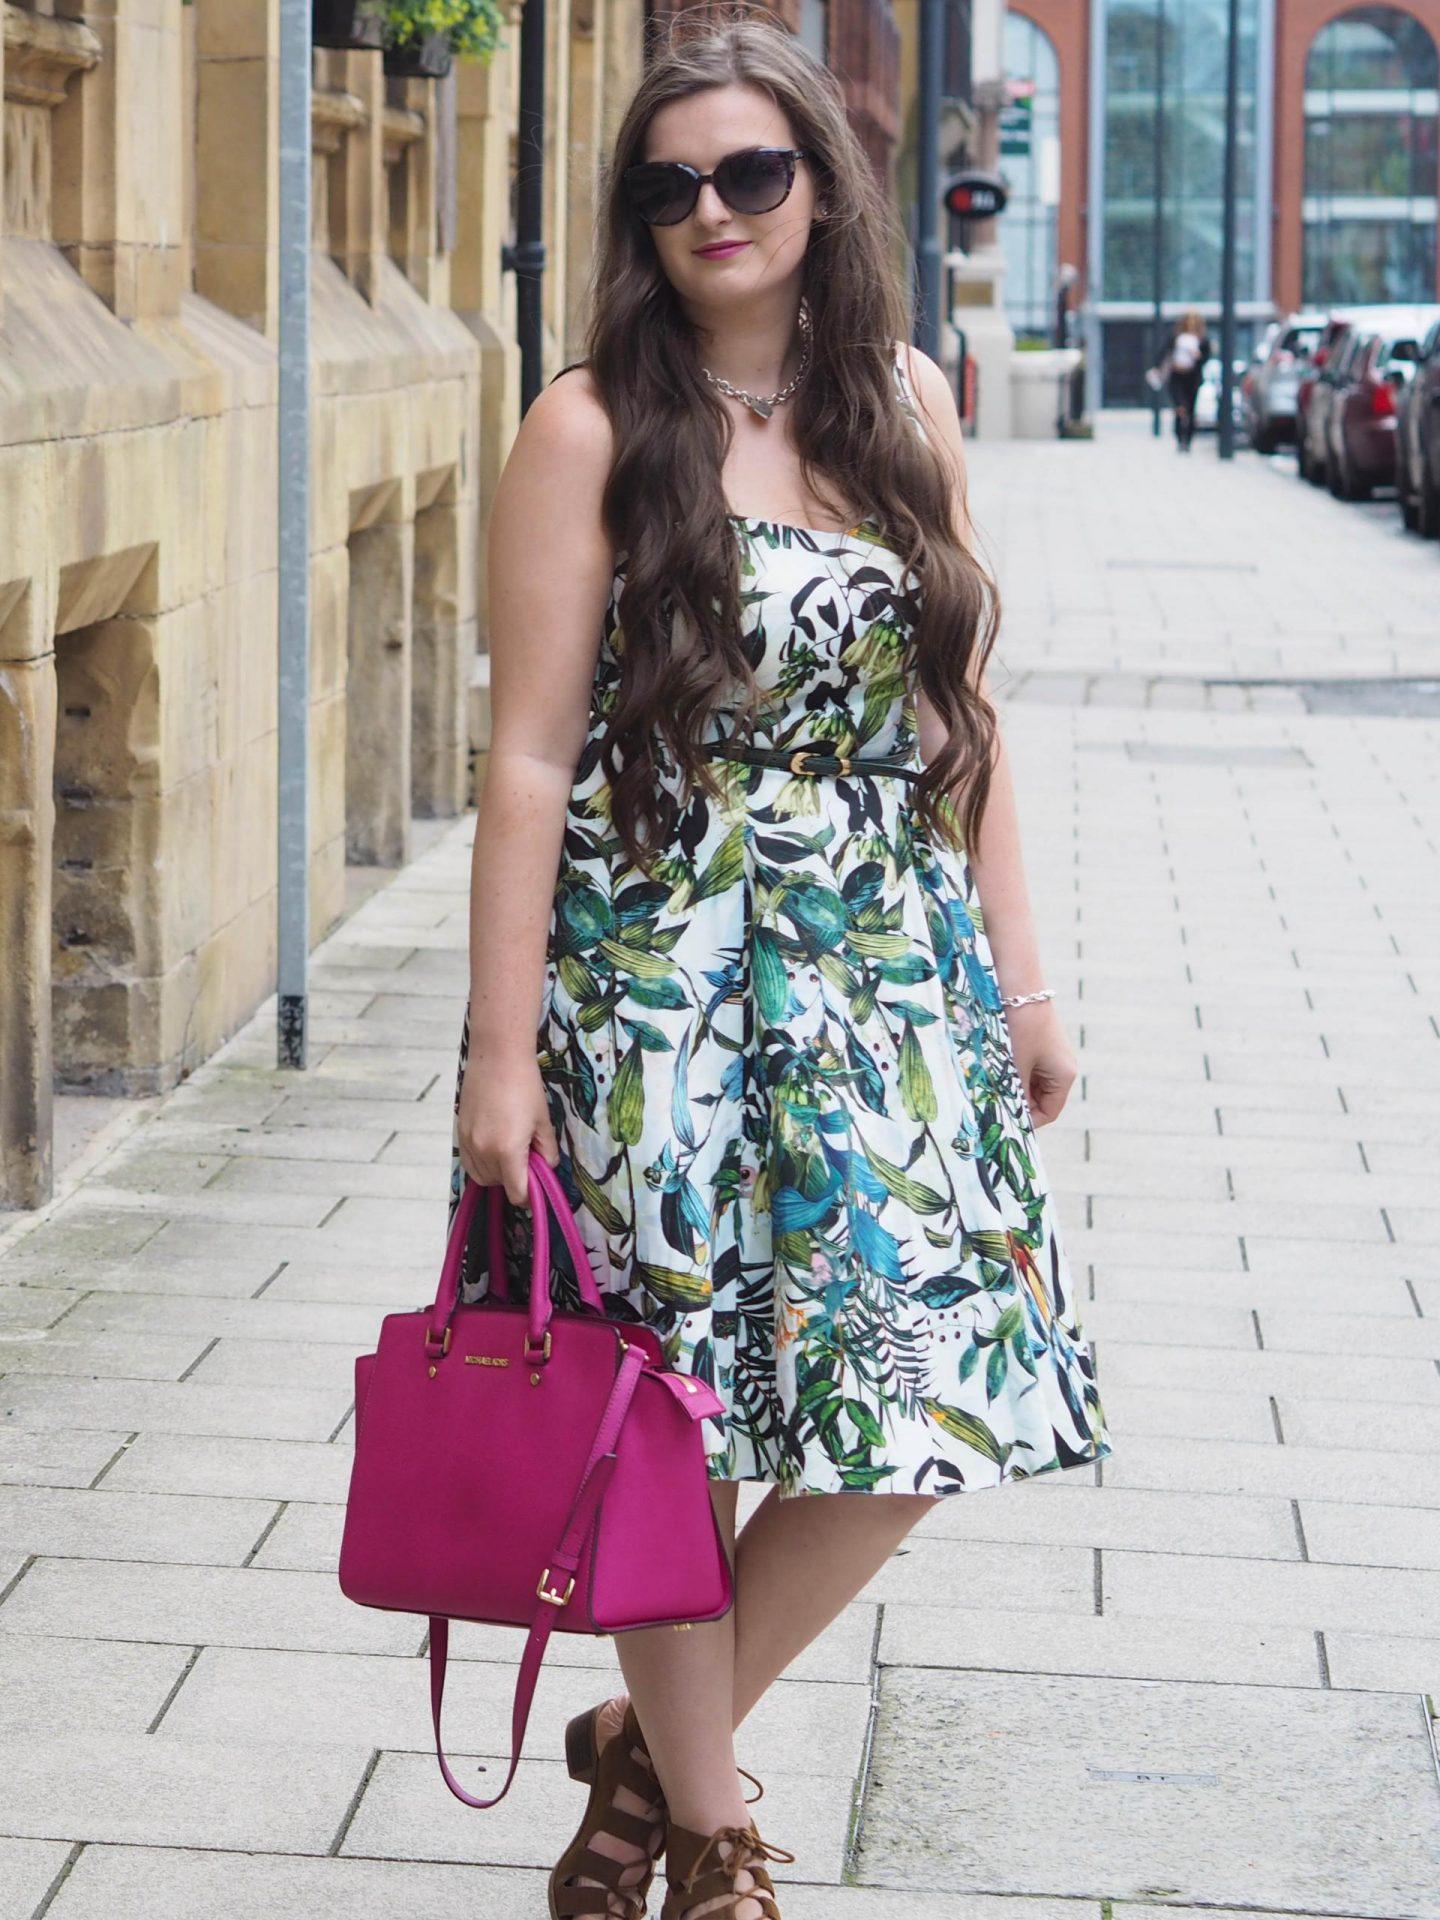 Ladies Who Brunch, Closet London - Rachel Nicole UK Fashion Blogger 3